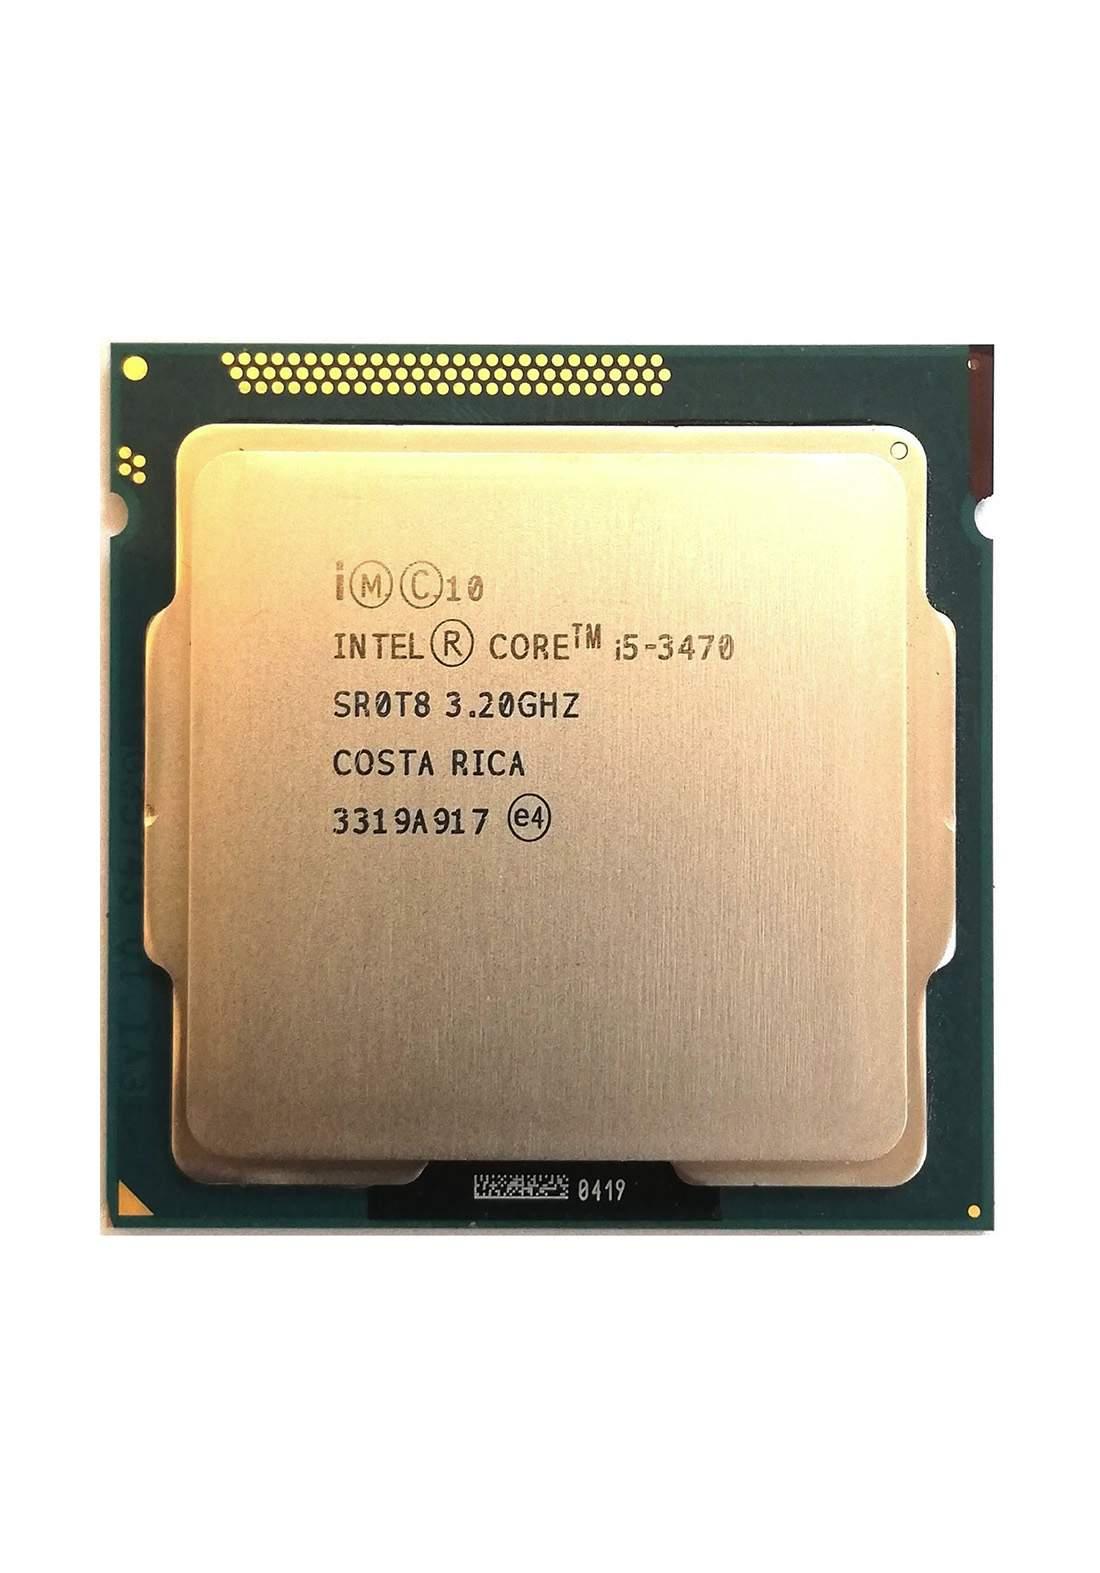 Intel Ci5 3470 Tray Packaging  Wholesale Processor معالج